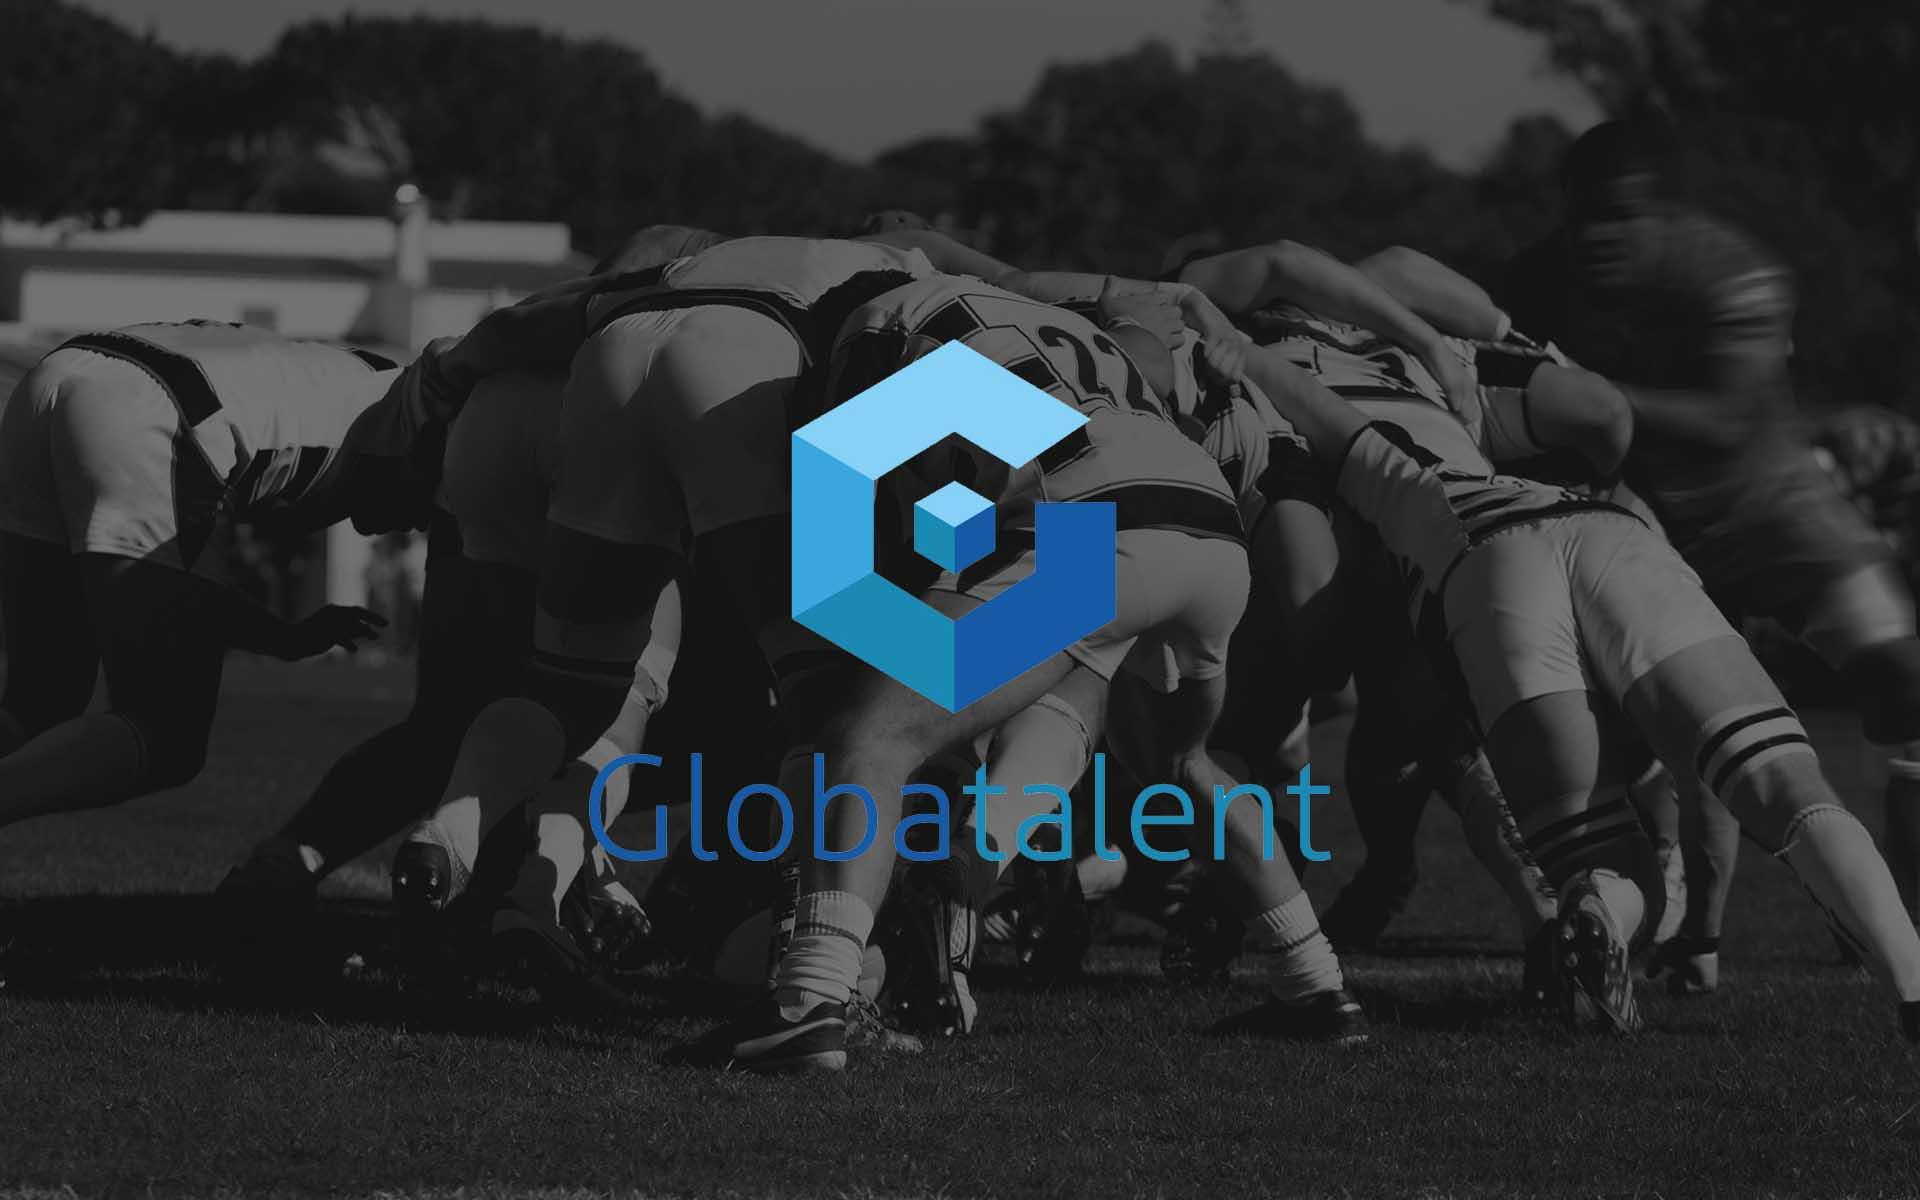 Globatalent Announces ICO